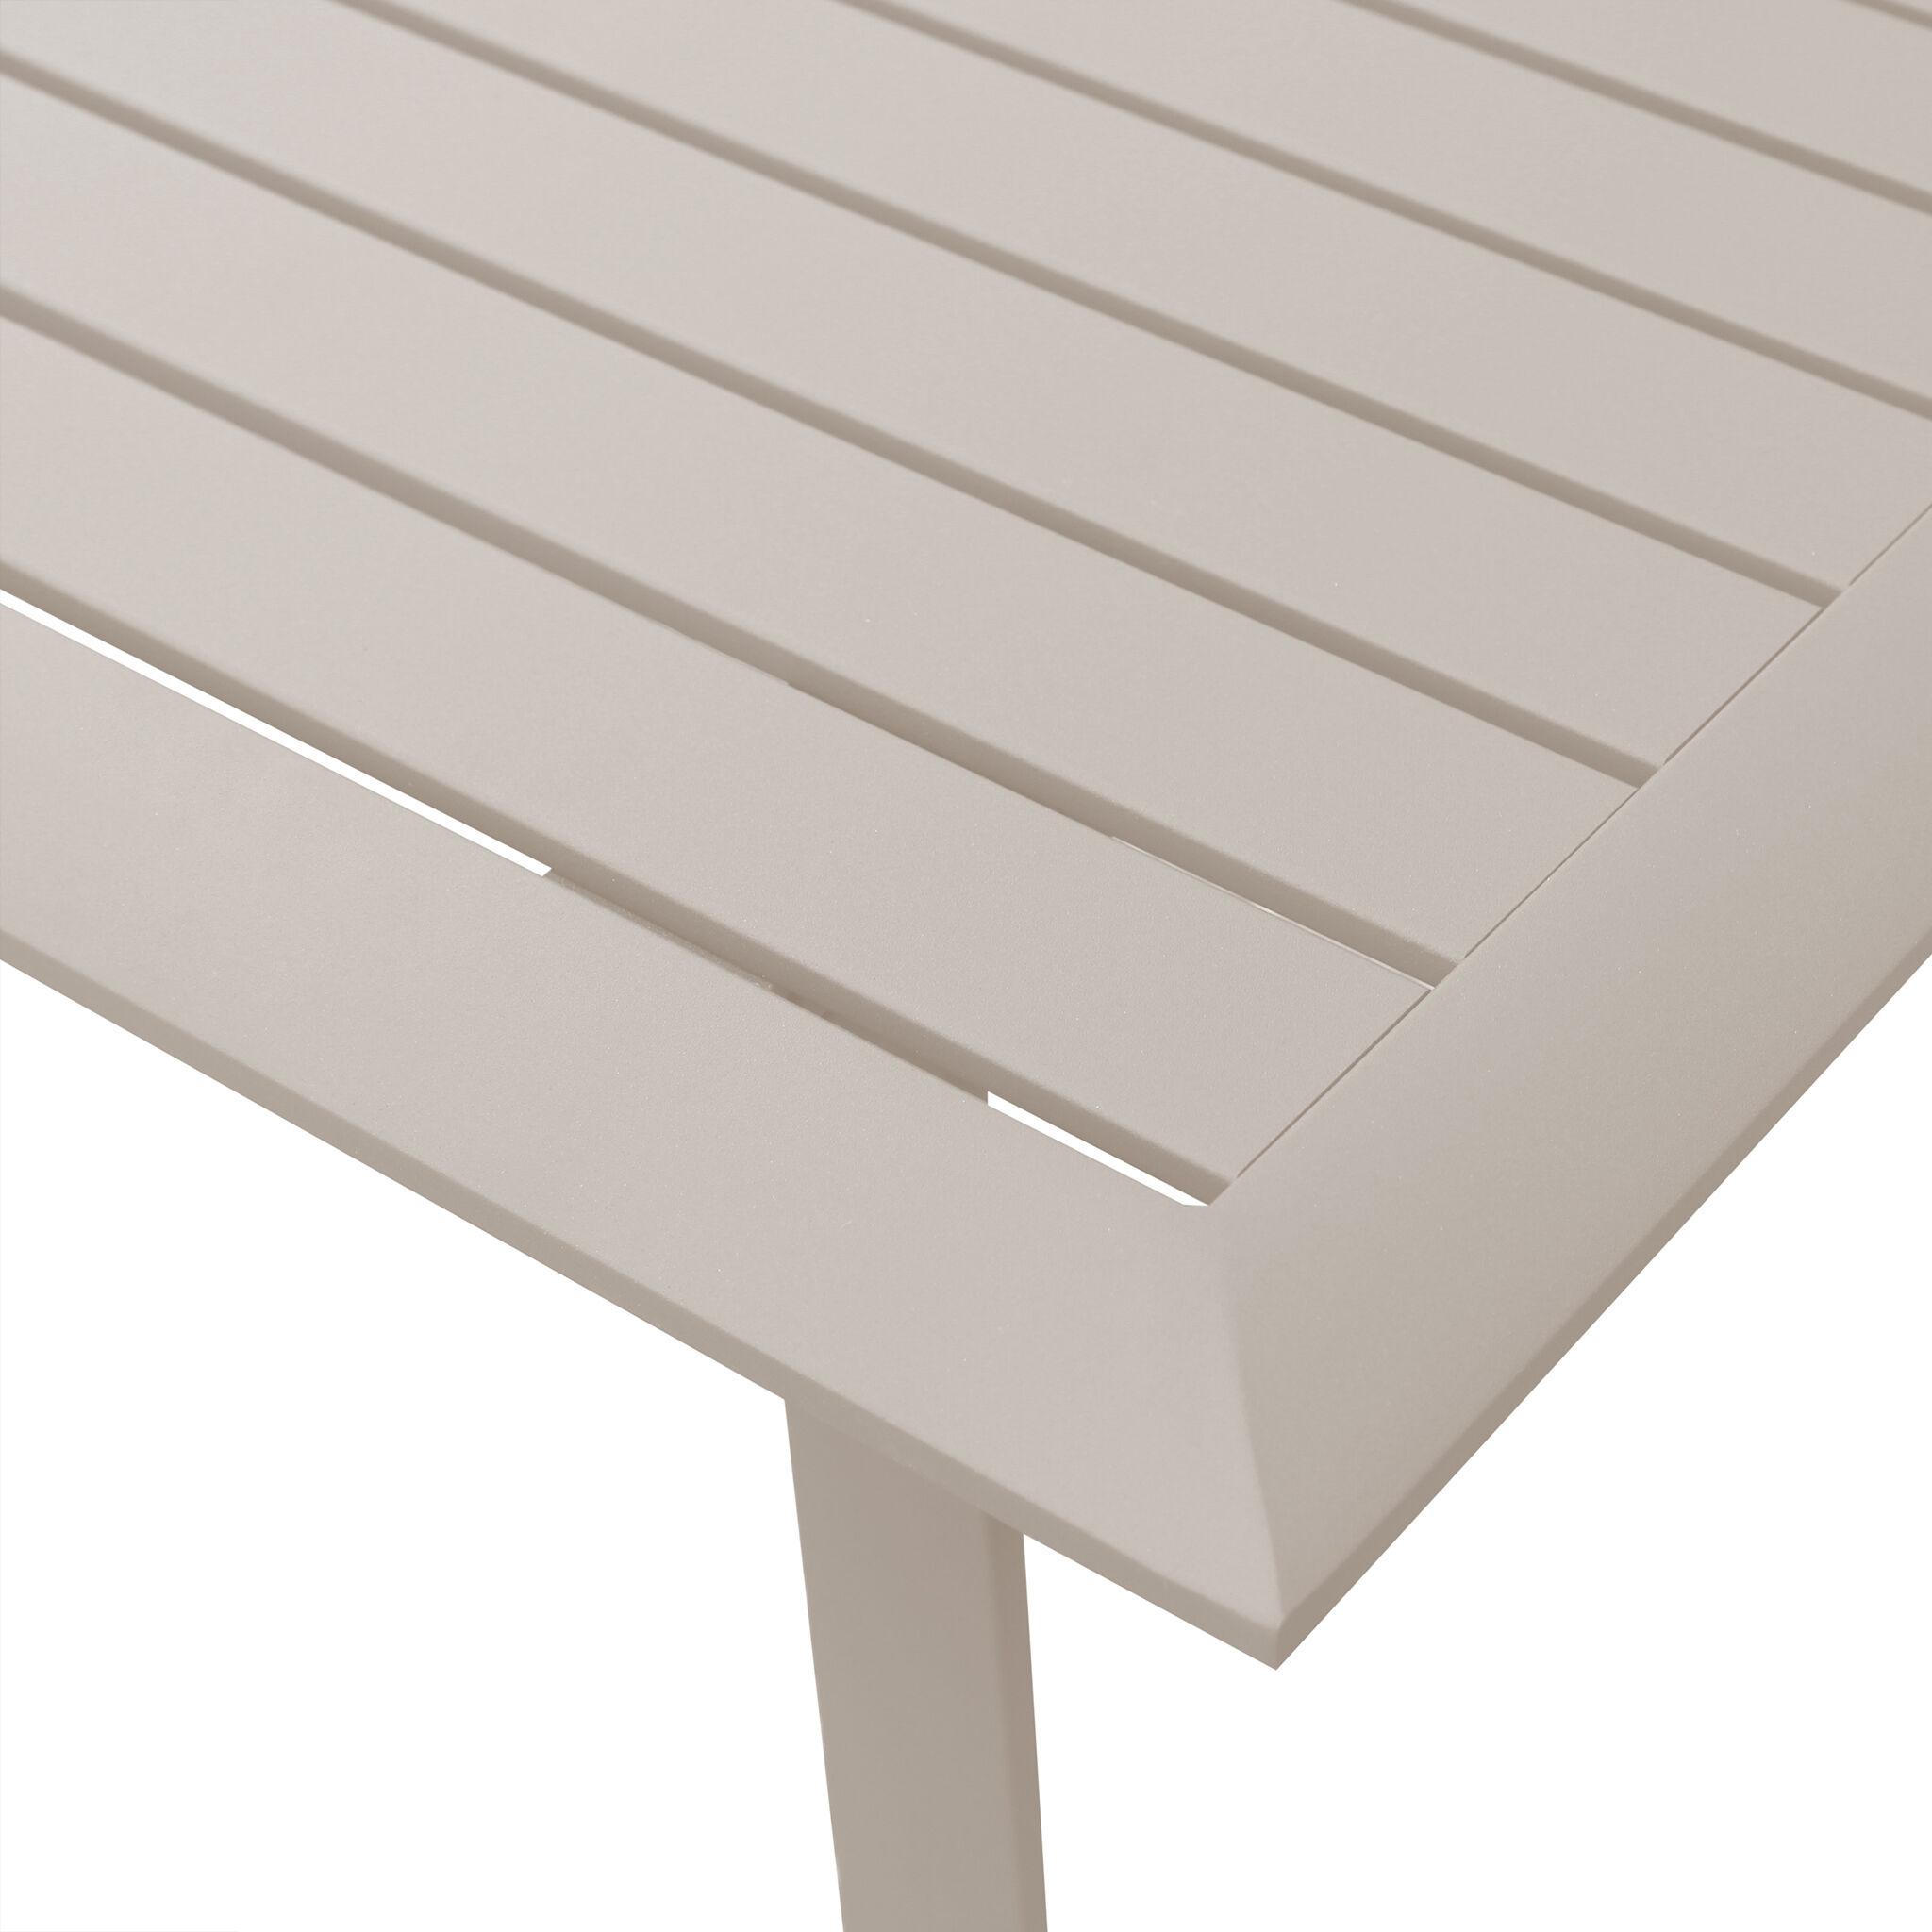 Milani Home EXSILIUM - salotto da giardino 2 posti in alluminio